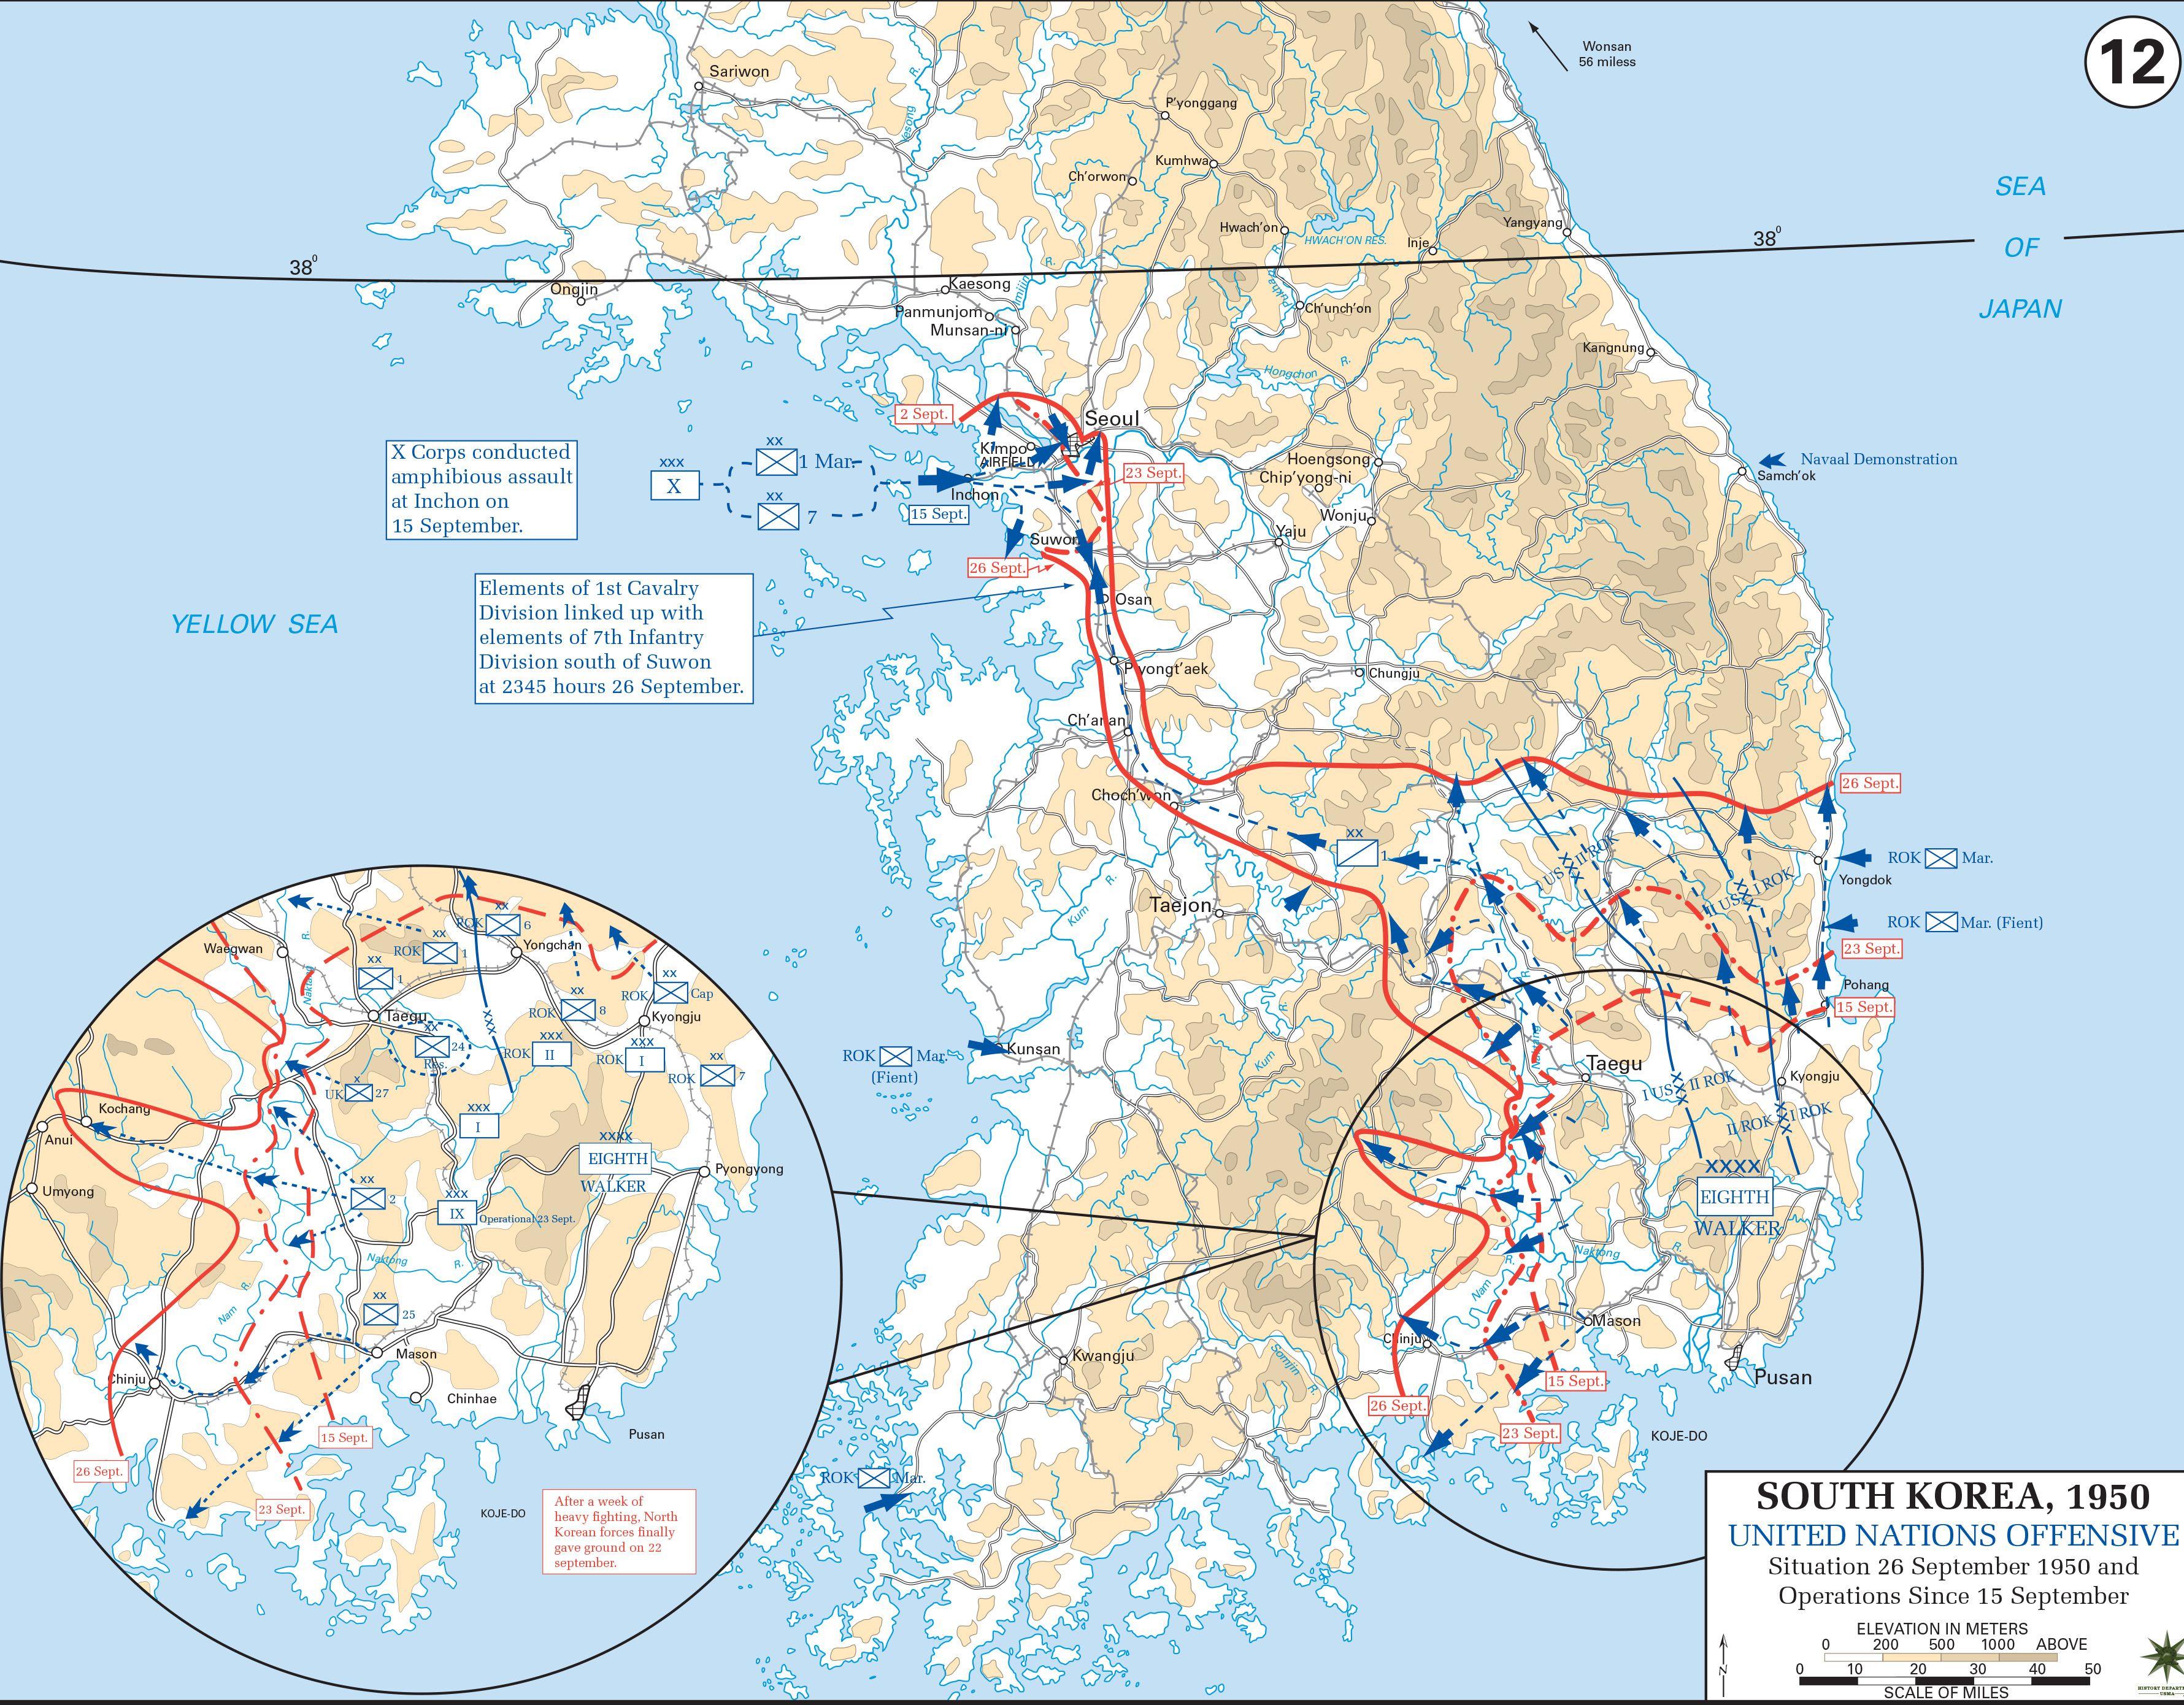 Map of Inchon Invasion and Pusan Perimeter Breakout